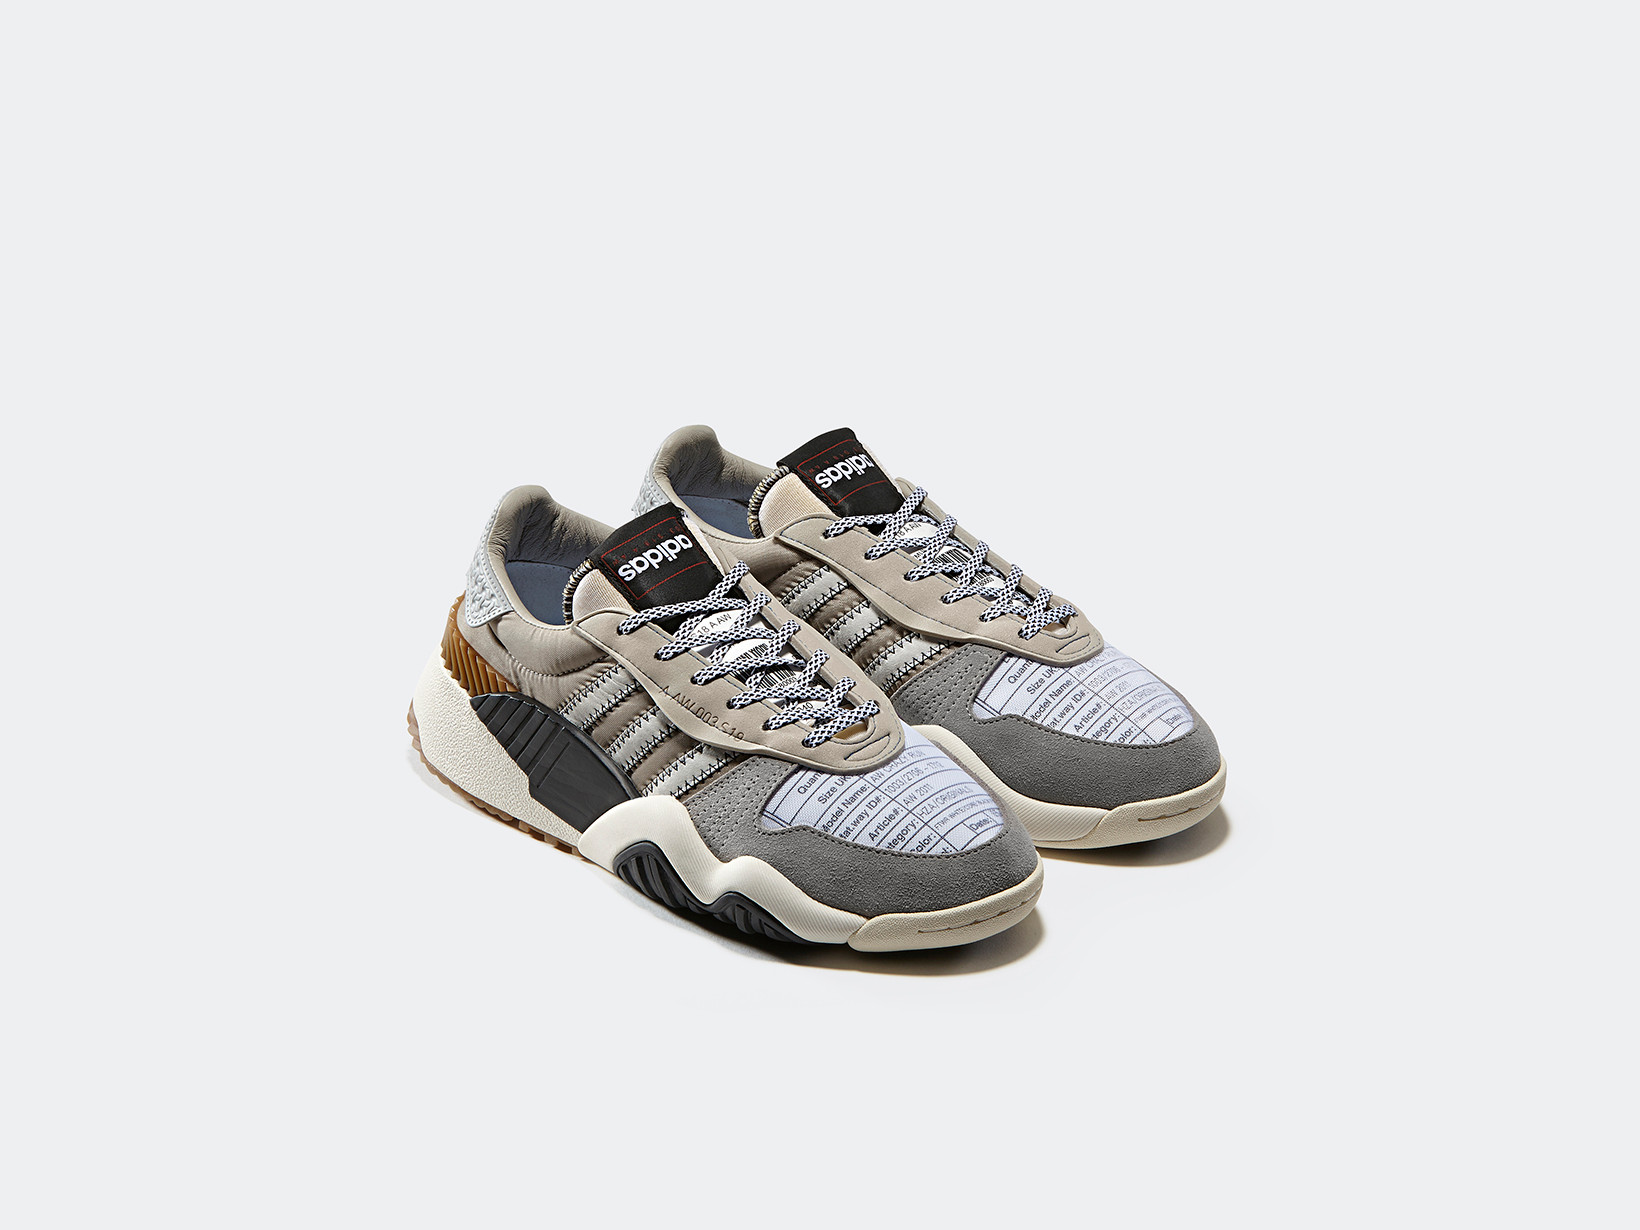 https---hypebeast.com-image-2018-06-adidas-originals-alexander-wang-season-3-drop-3-29